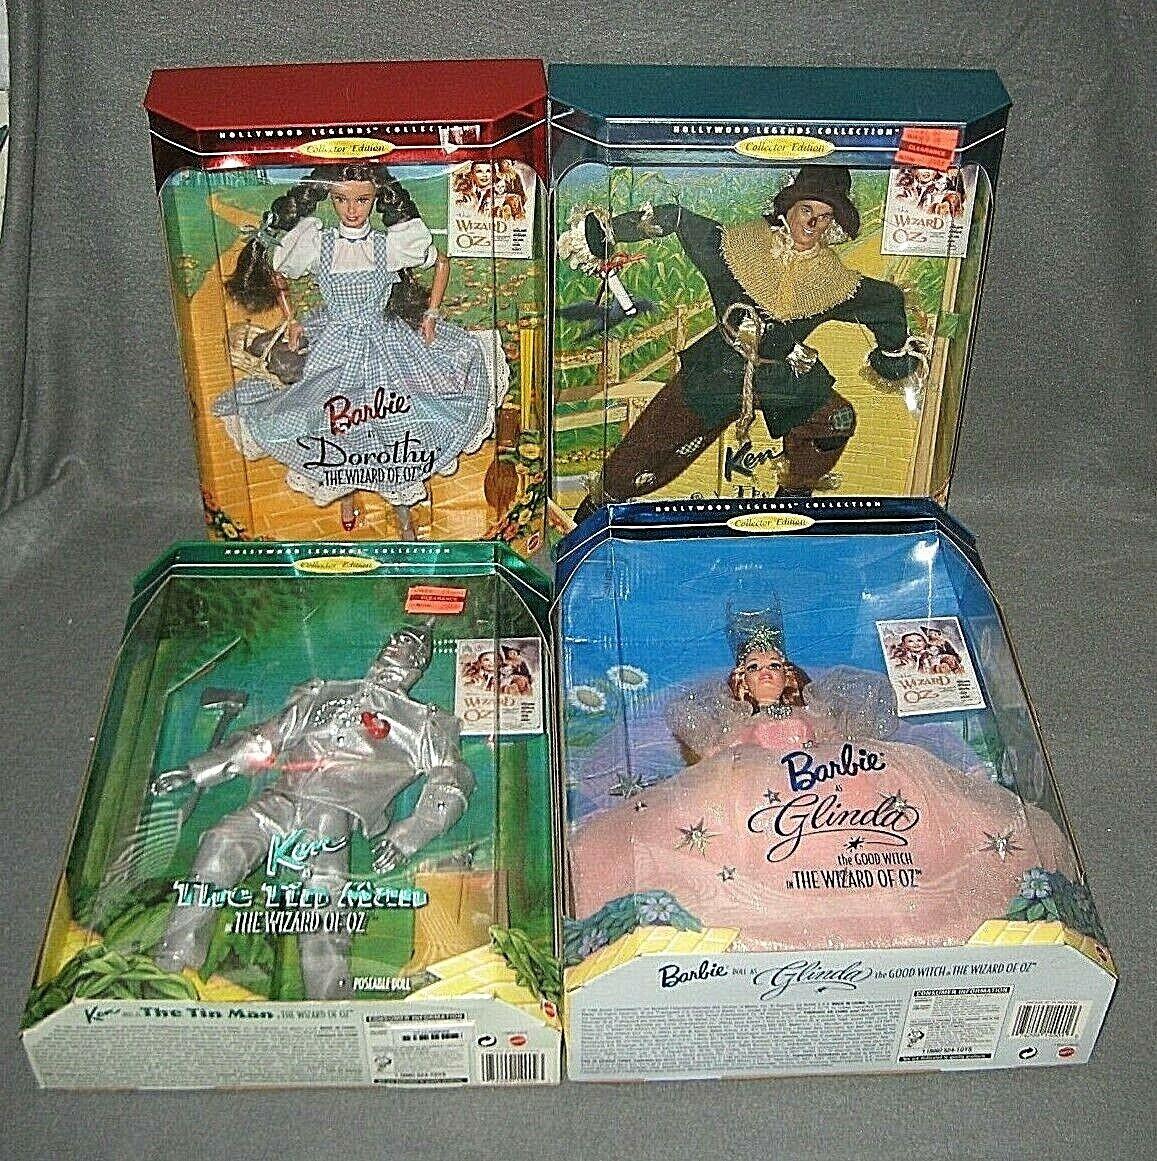 Barbie 1995 Collector Edition Wizard of OZ DgoldTHY TIN MAN GLINDA & SCARECROW